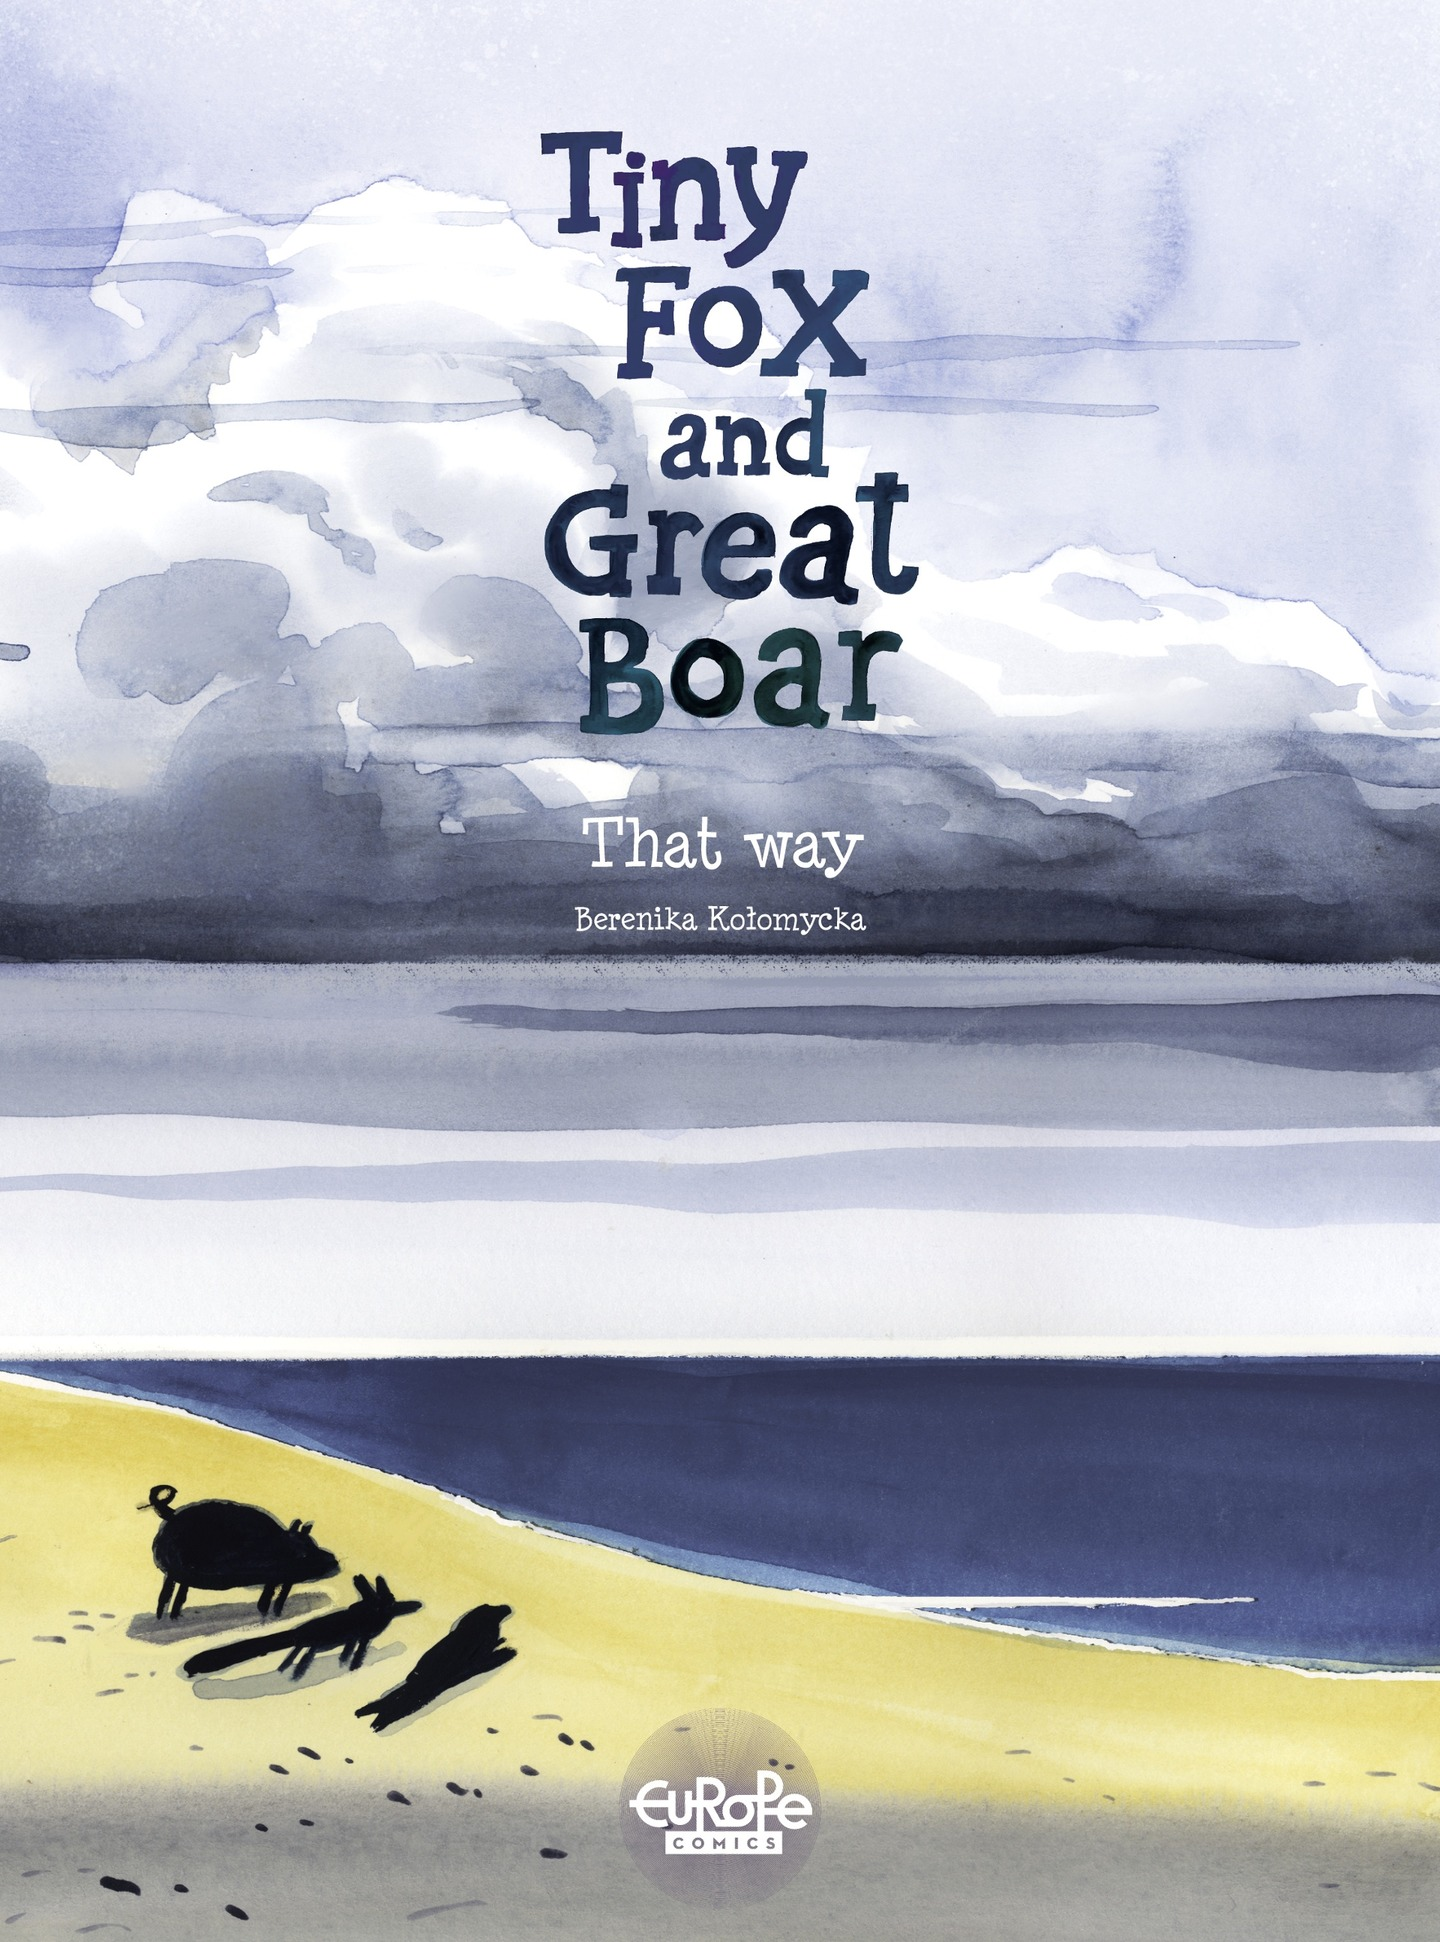 Tiny Fox and Great Boar  - ...